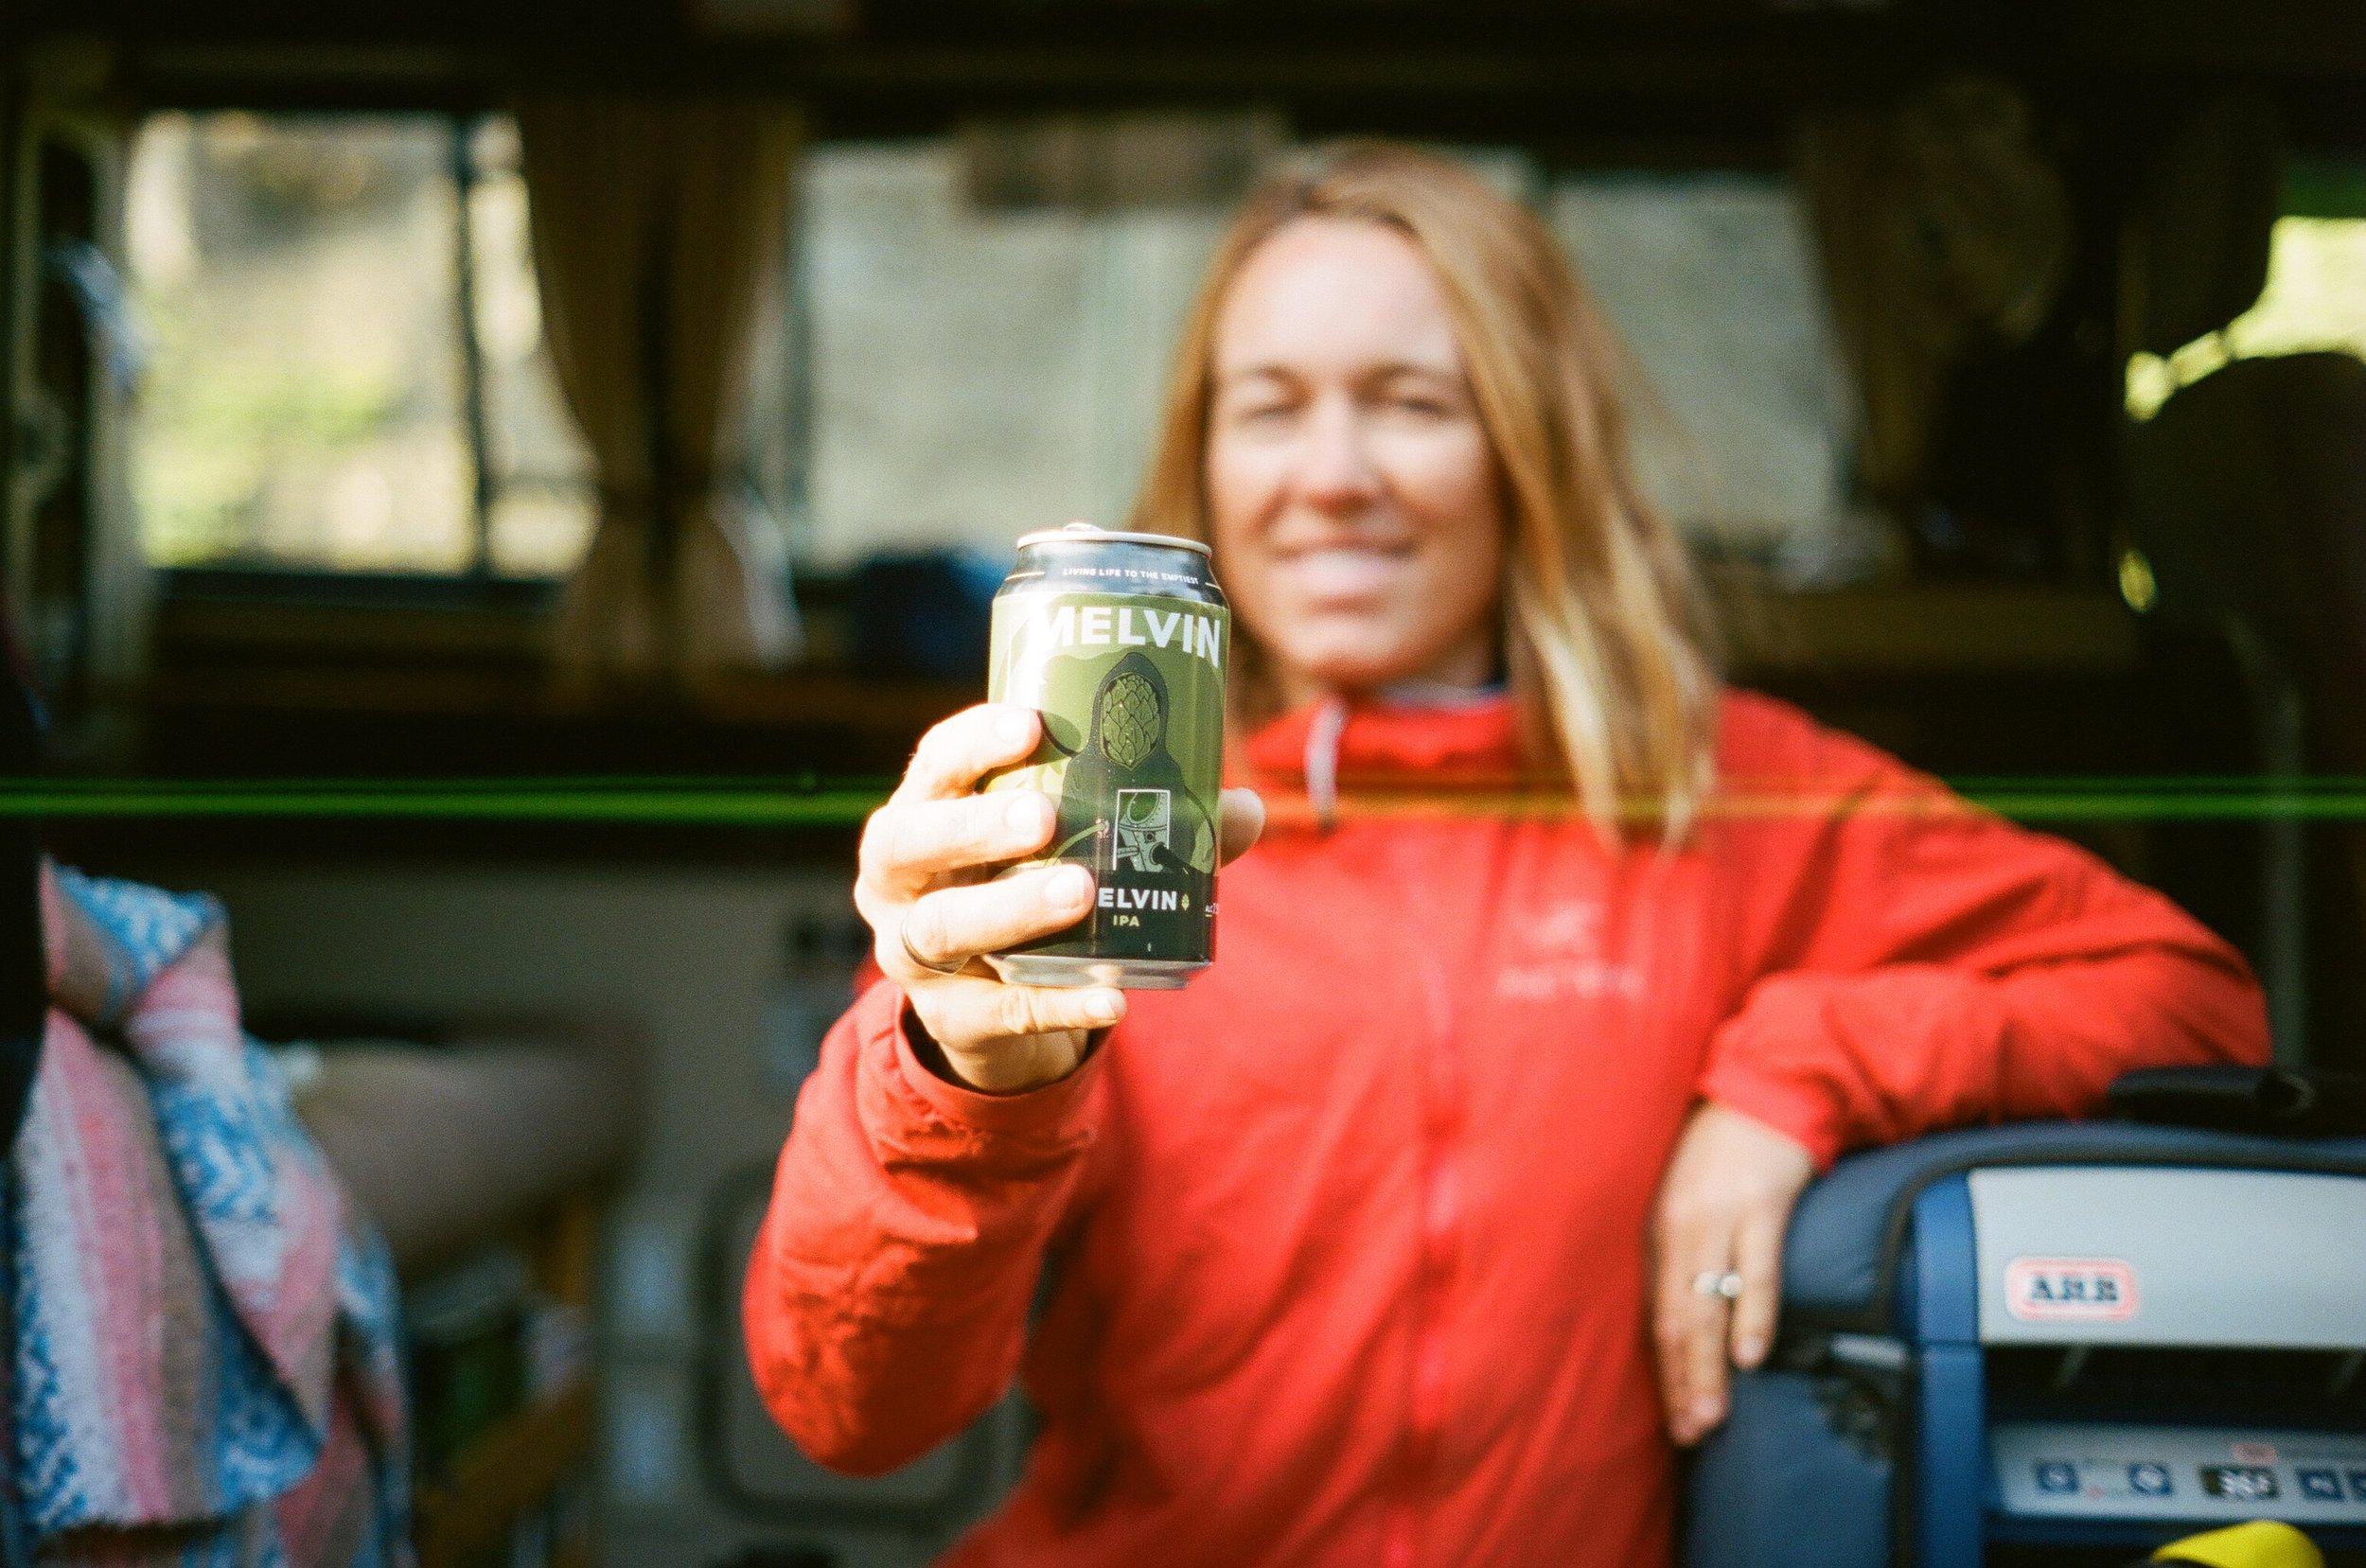 MAK enjoying her favorite beer from Melvin, 35mm